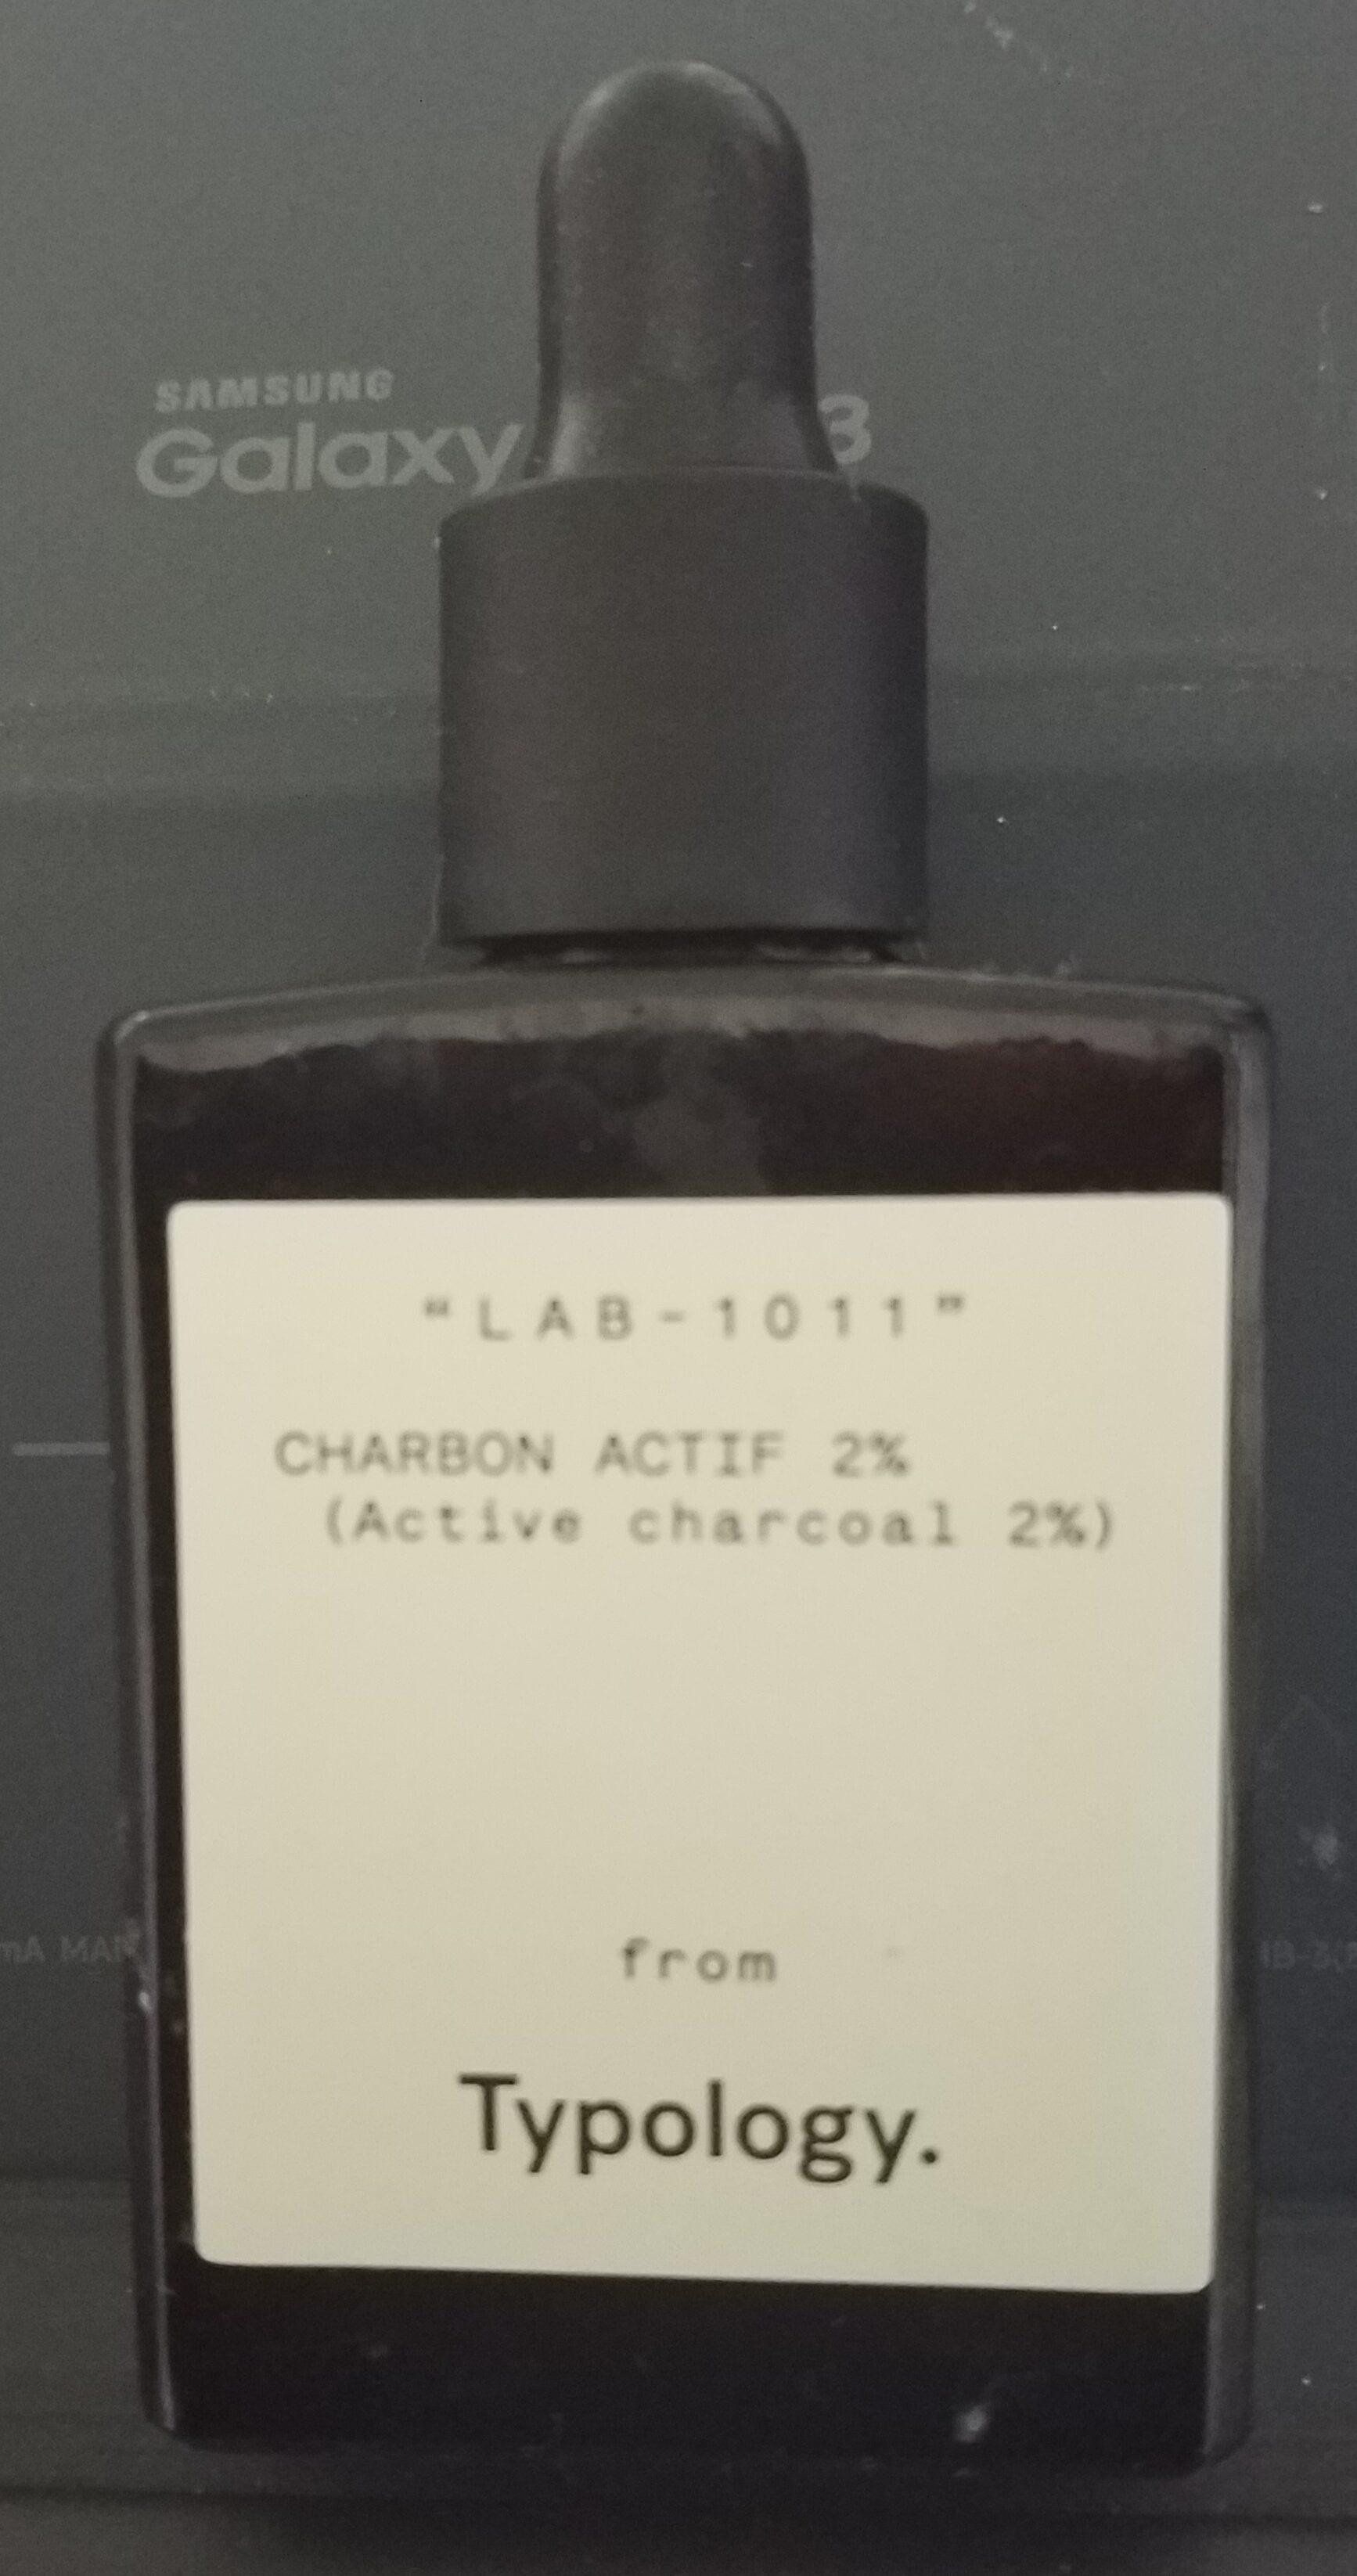 CHARBON ACTIF 2% - Product - fr